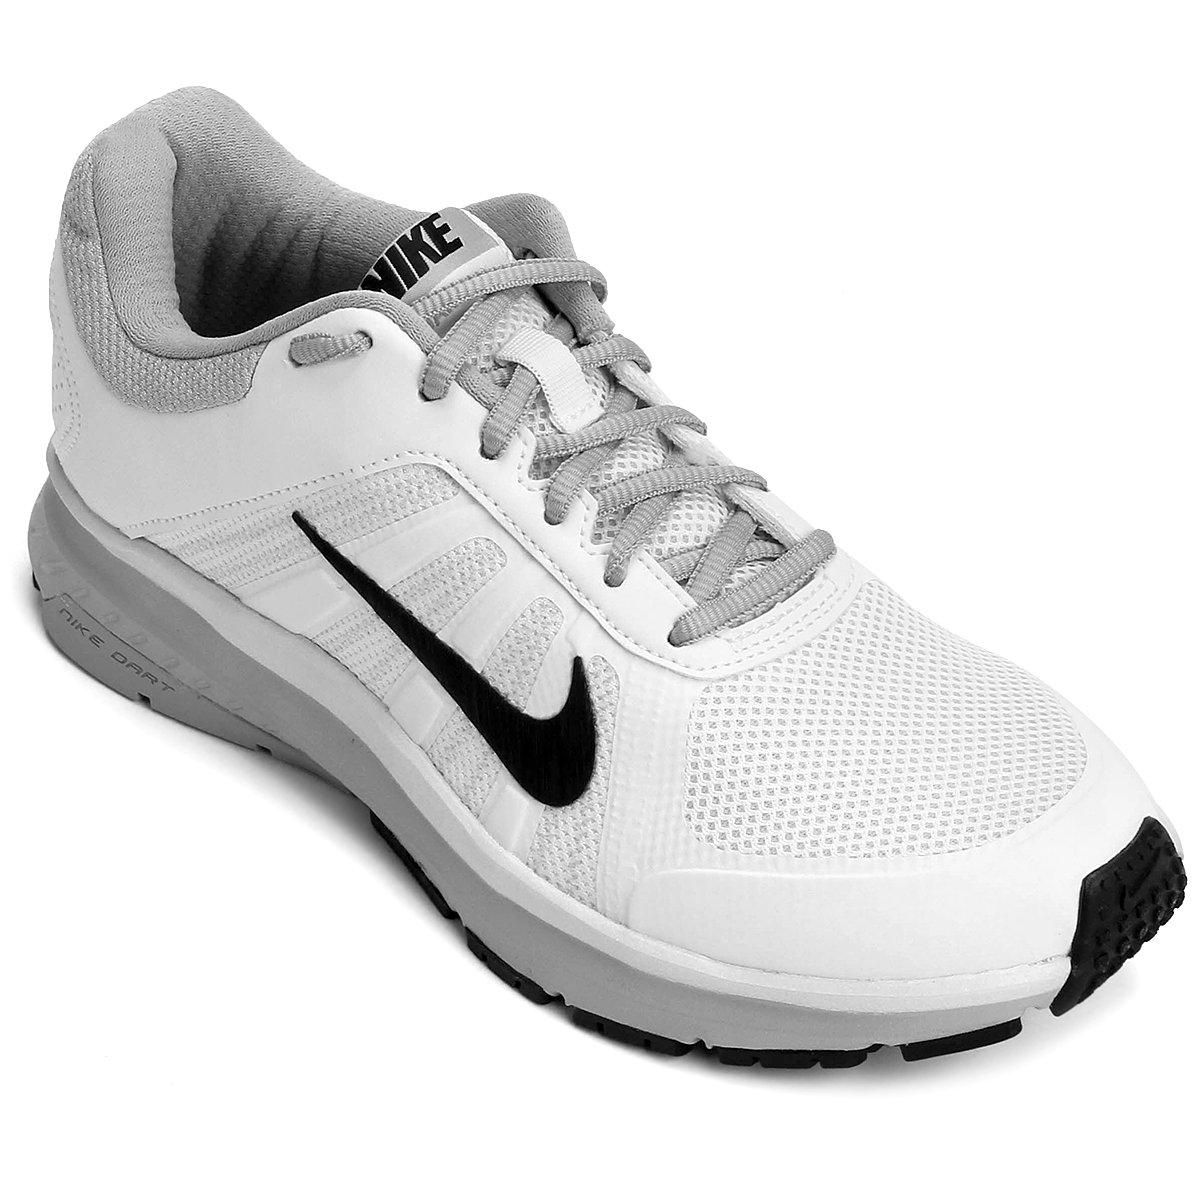 992f64f24110f Tênis Nike Dart 12 MSL Feminino - Branco e Preto - Compre Agora ...